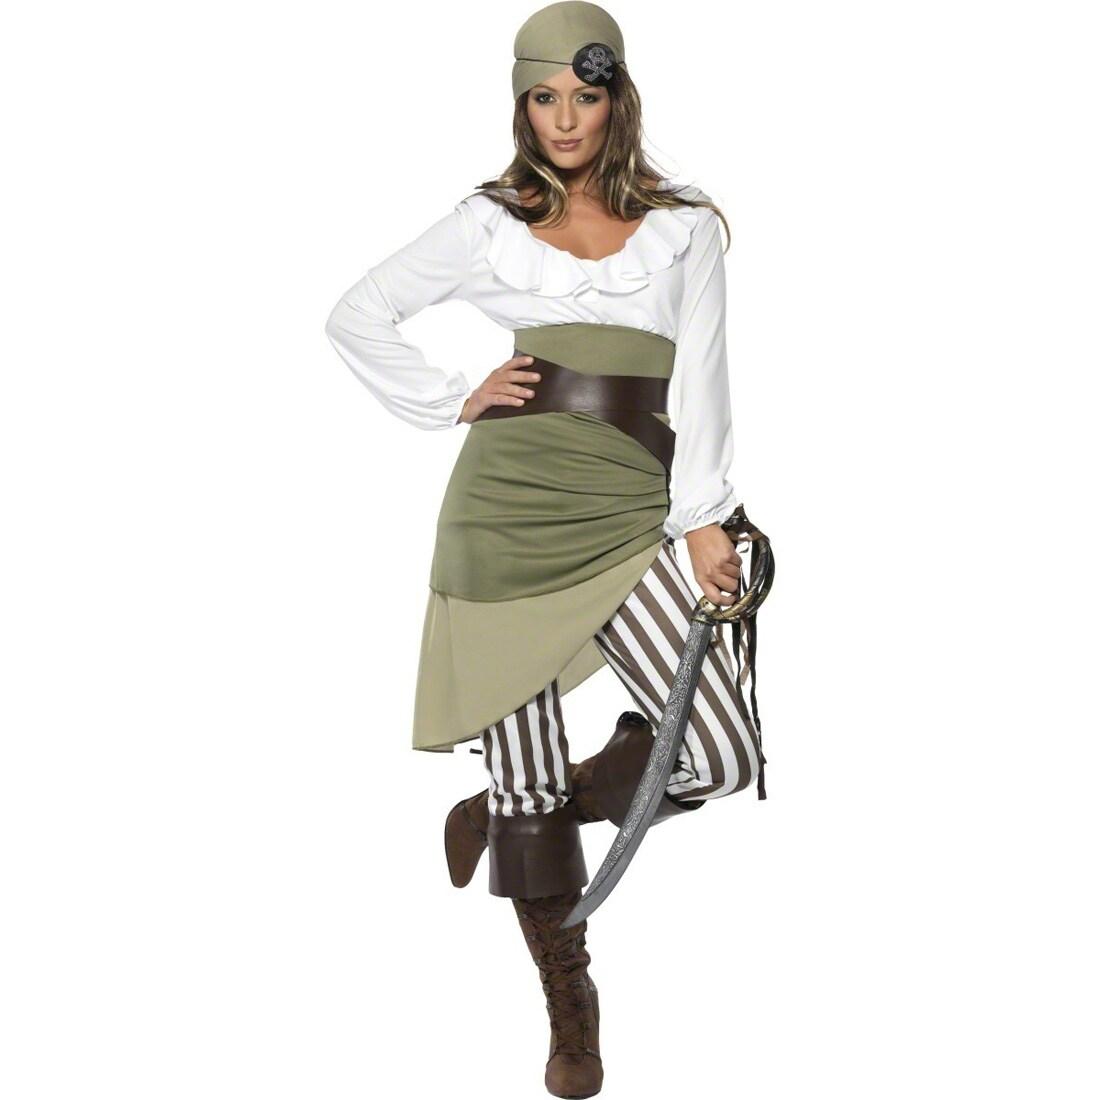 32-46 2-teilig Piratenkostüm Pirat Karneval 11 30731SMY Piratin Damen Kostüm Gr